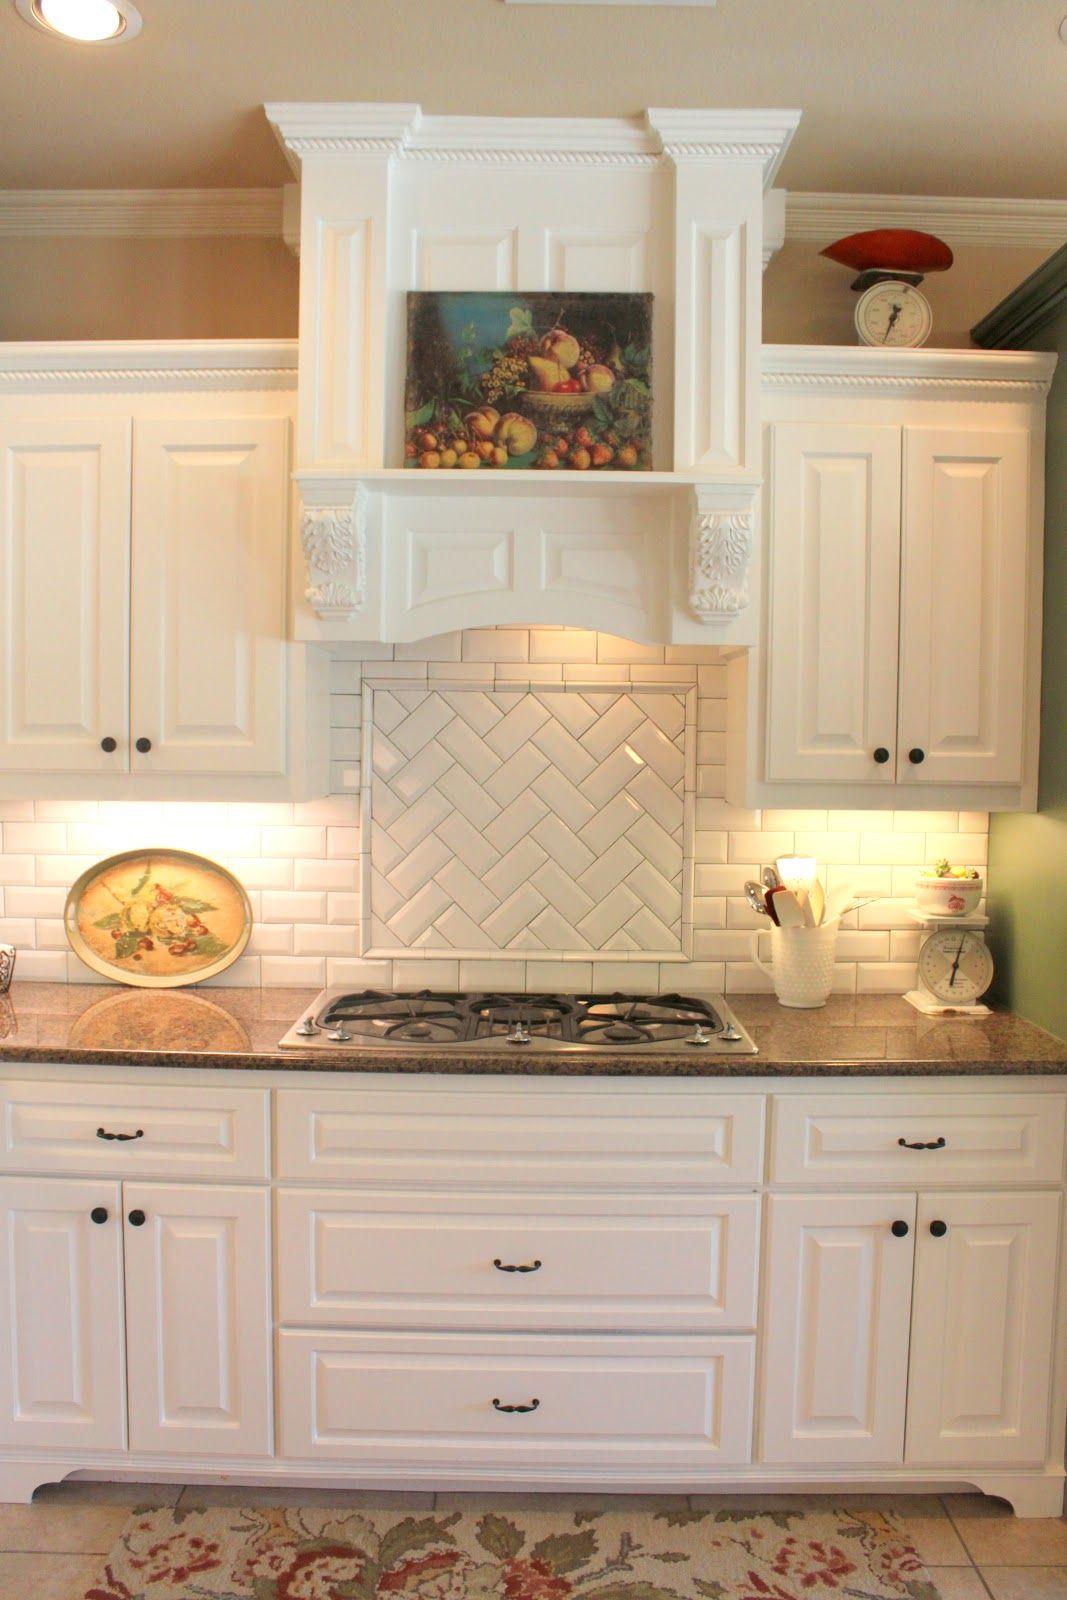 Backsplash idea above stove | Trendy kitchen backsplash ...